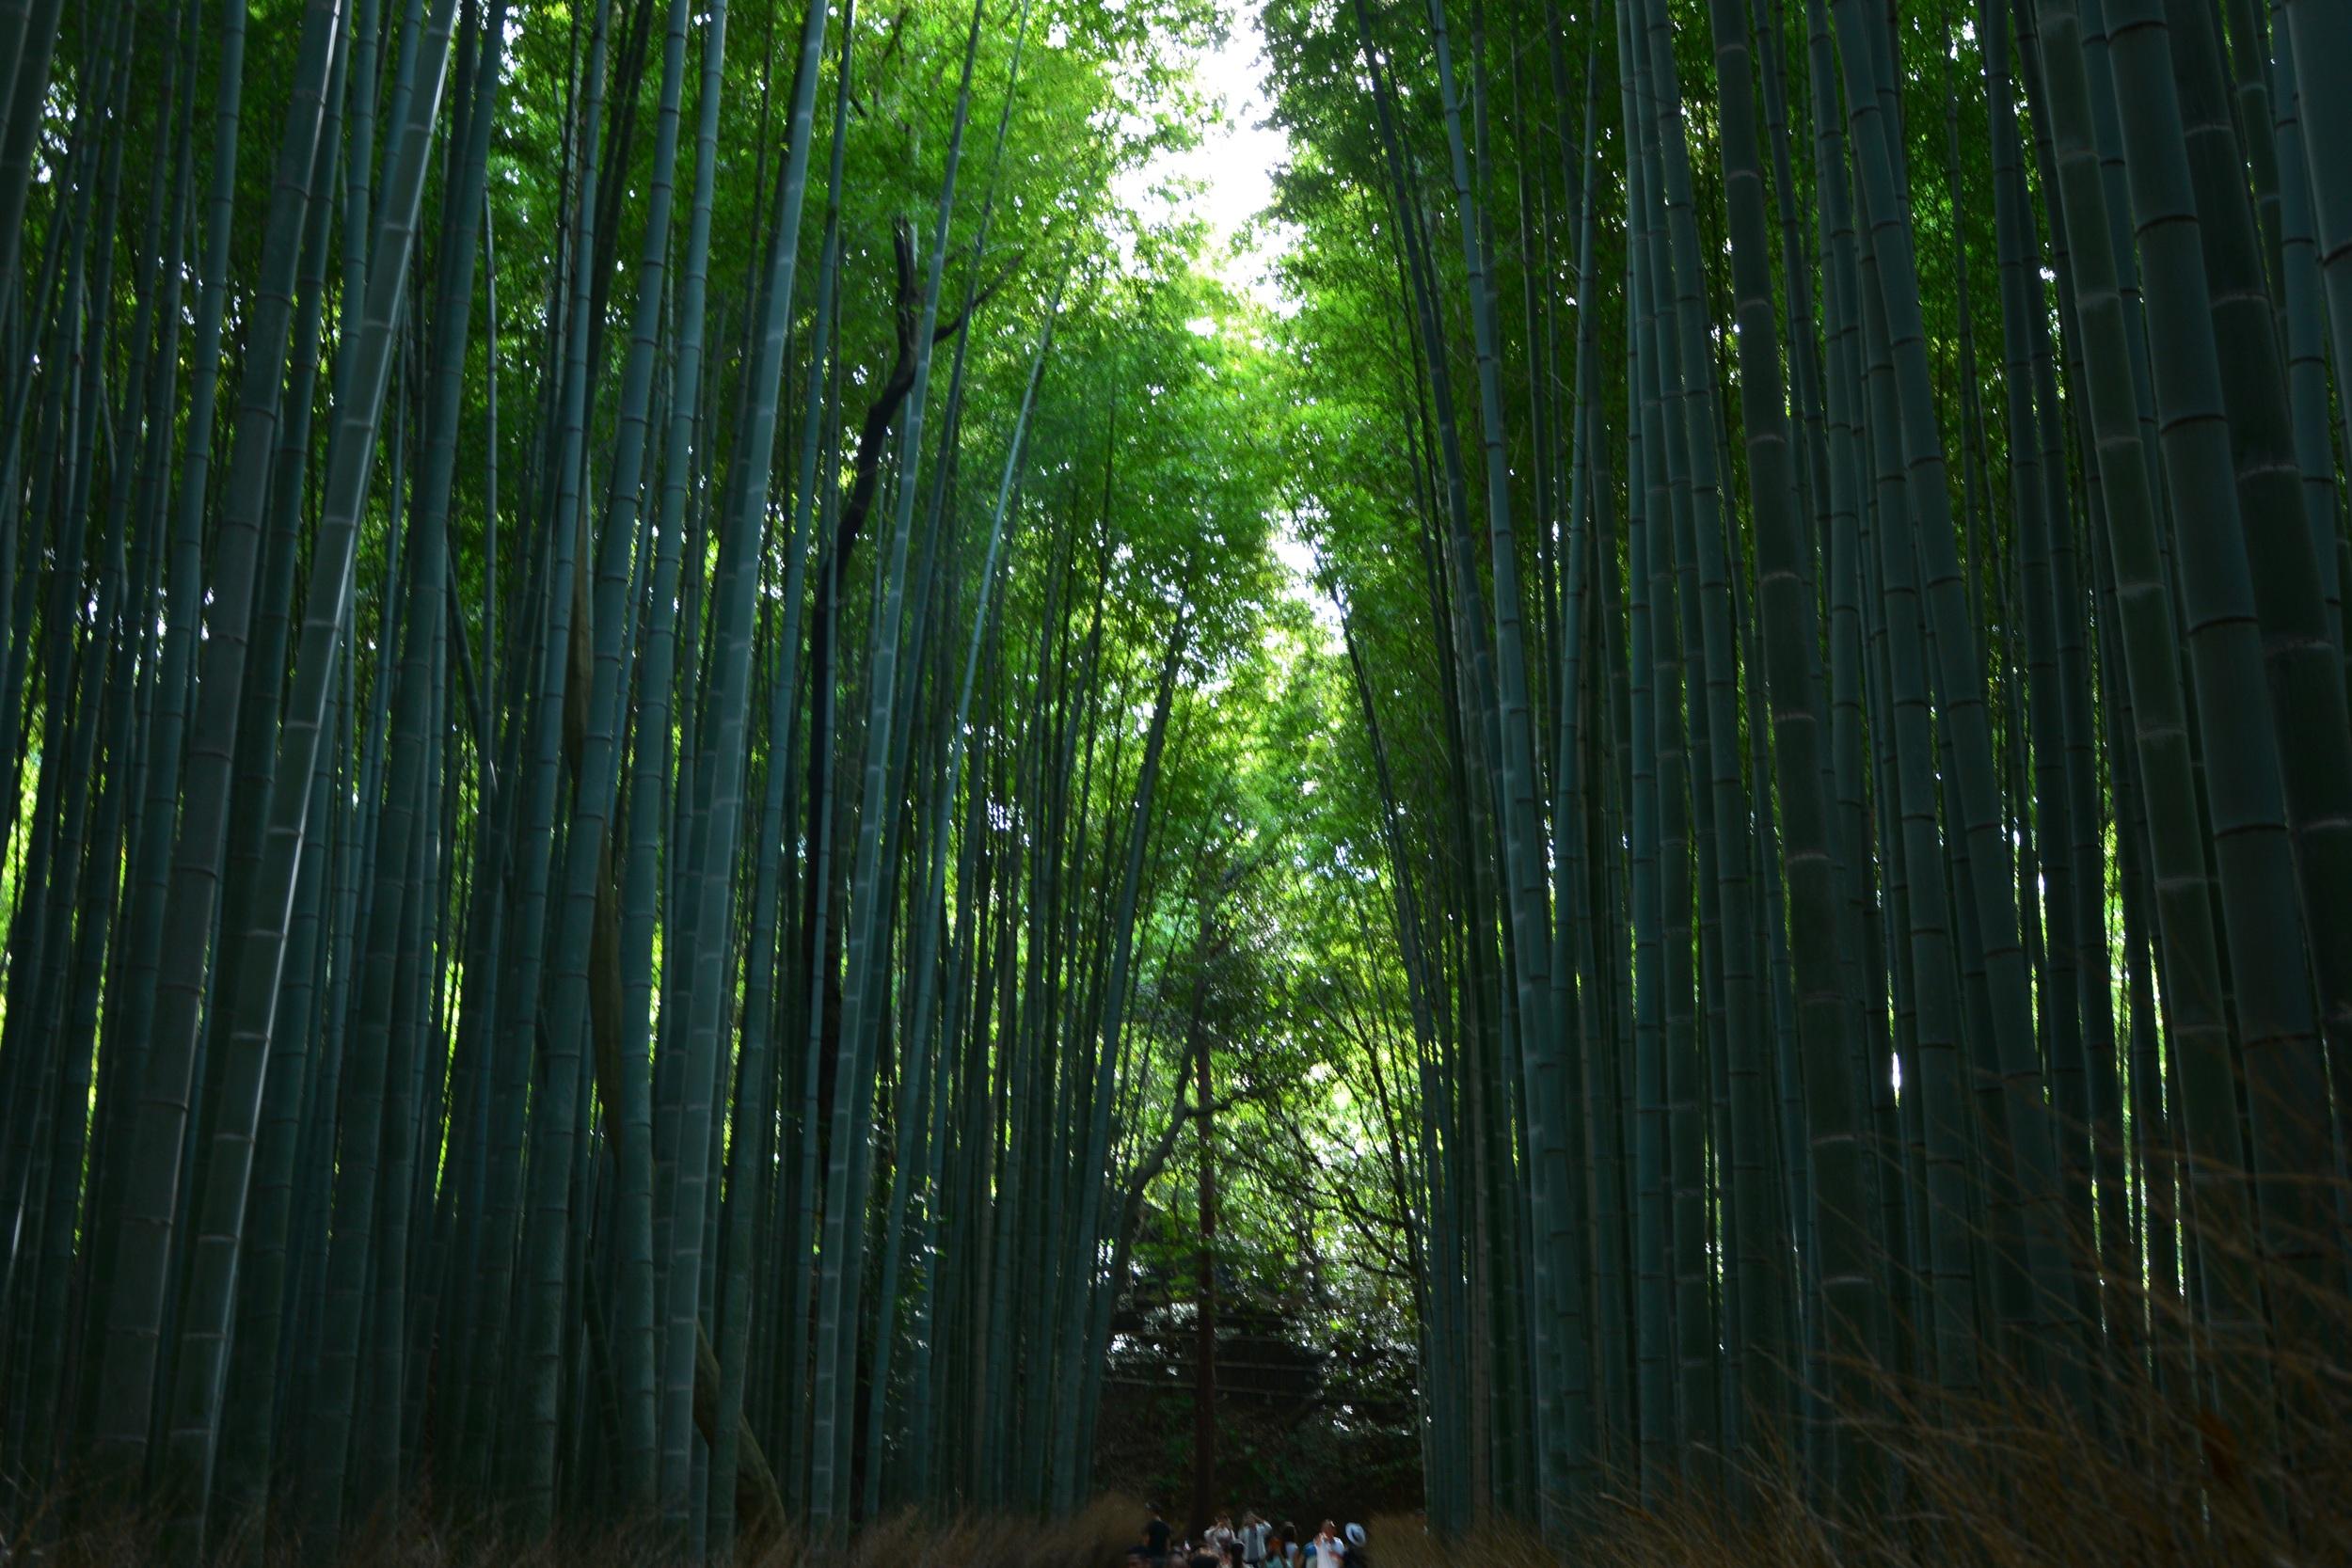 Bamboo forest walk.